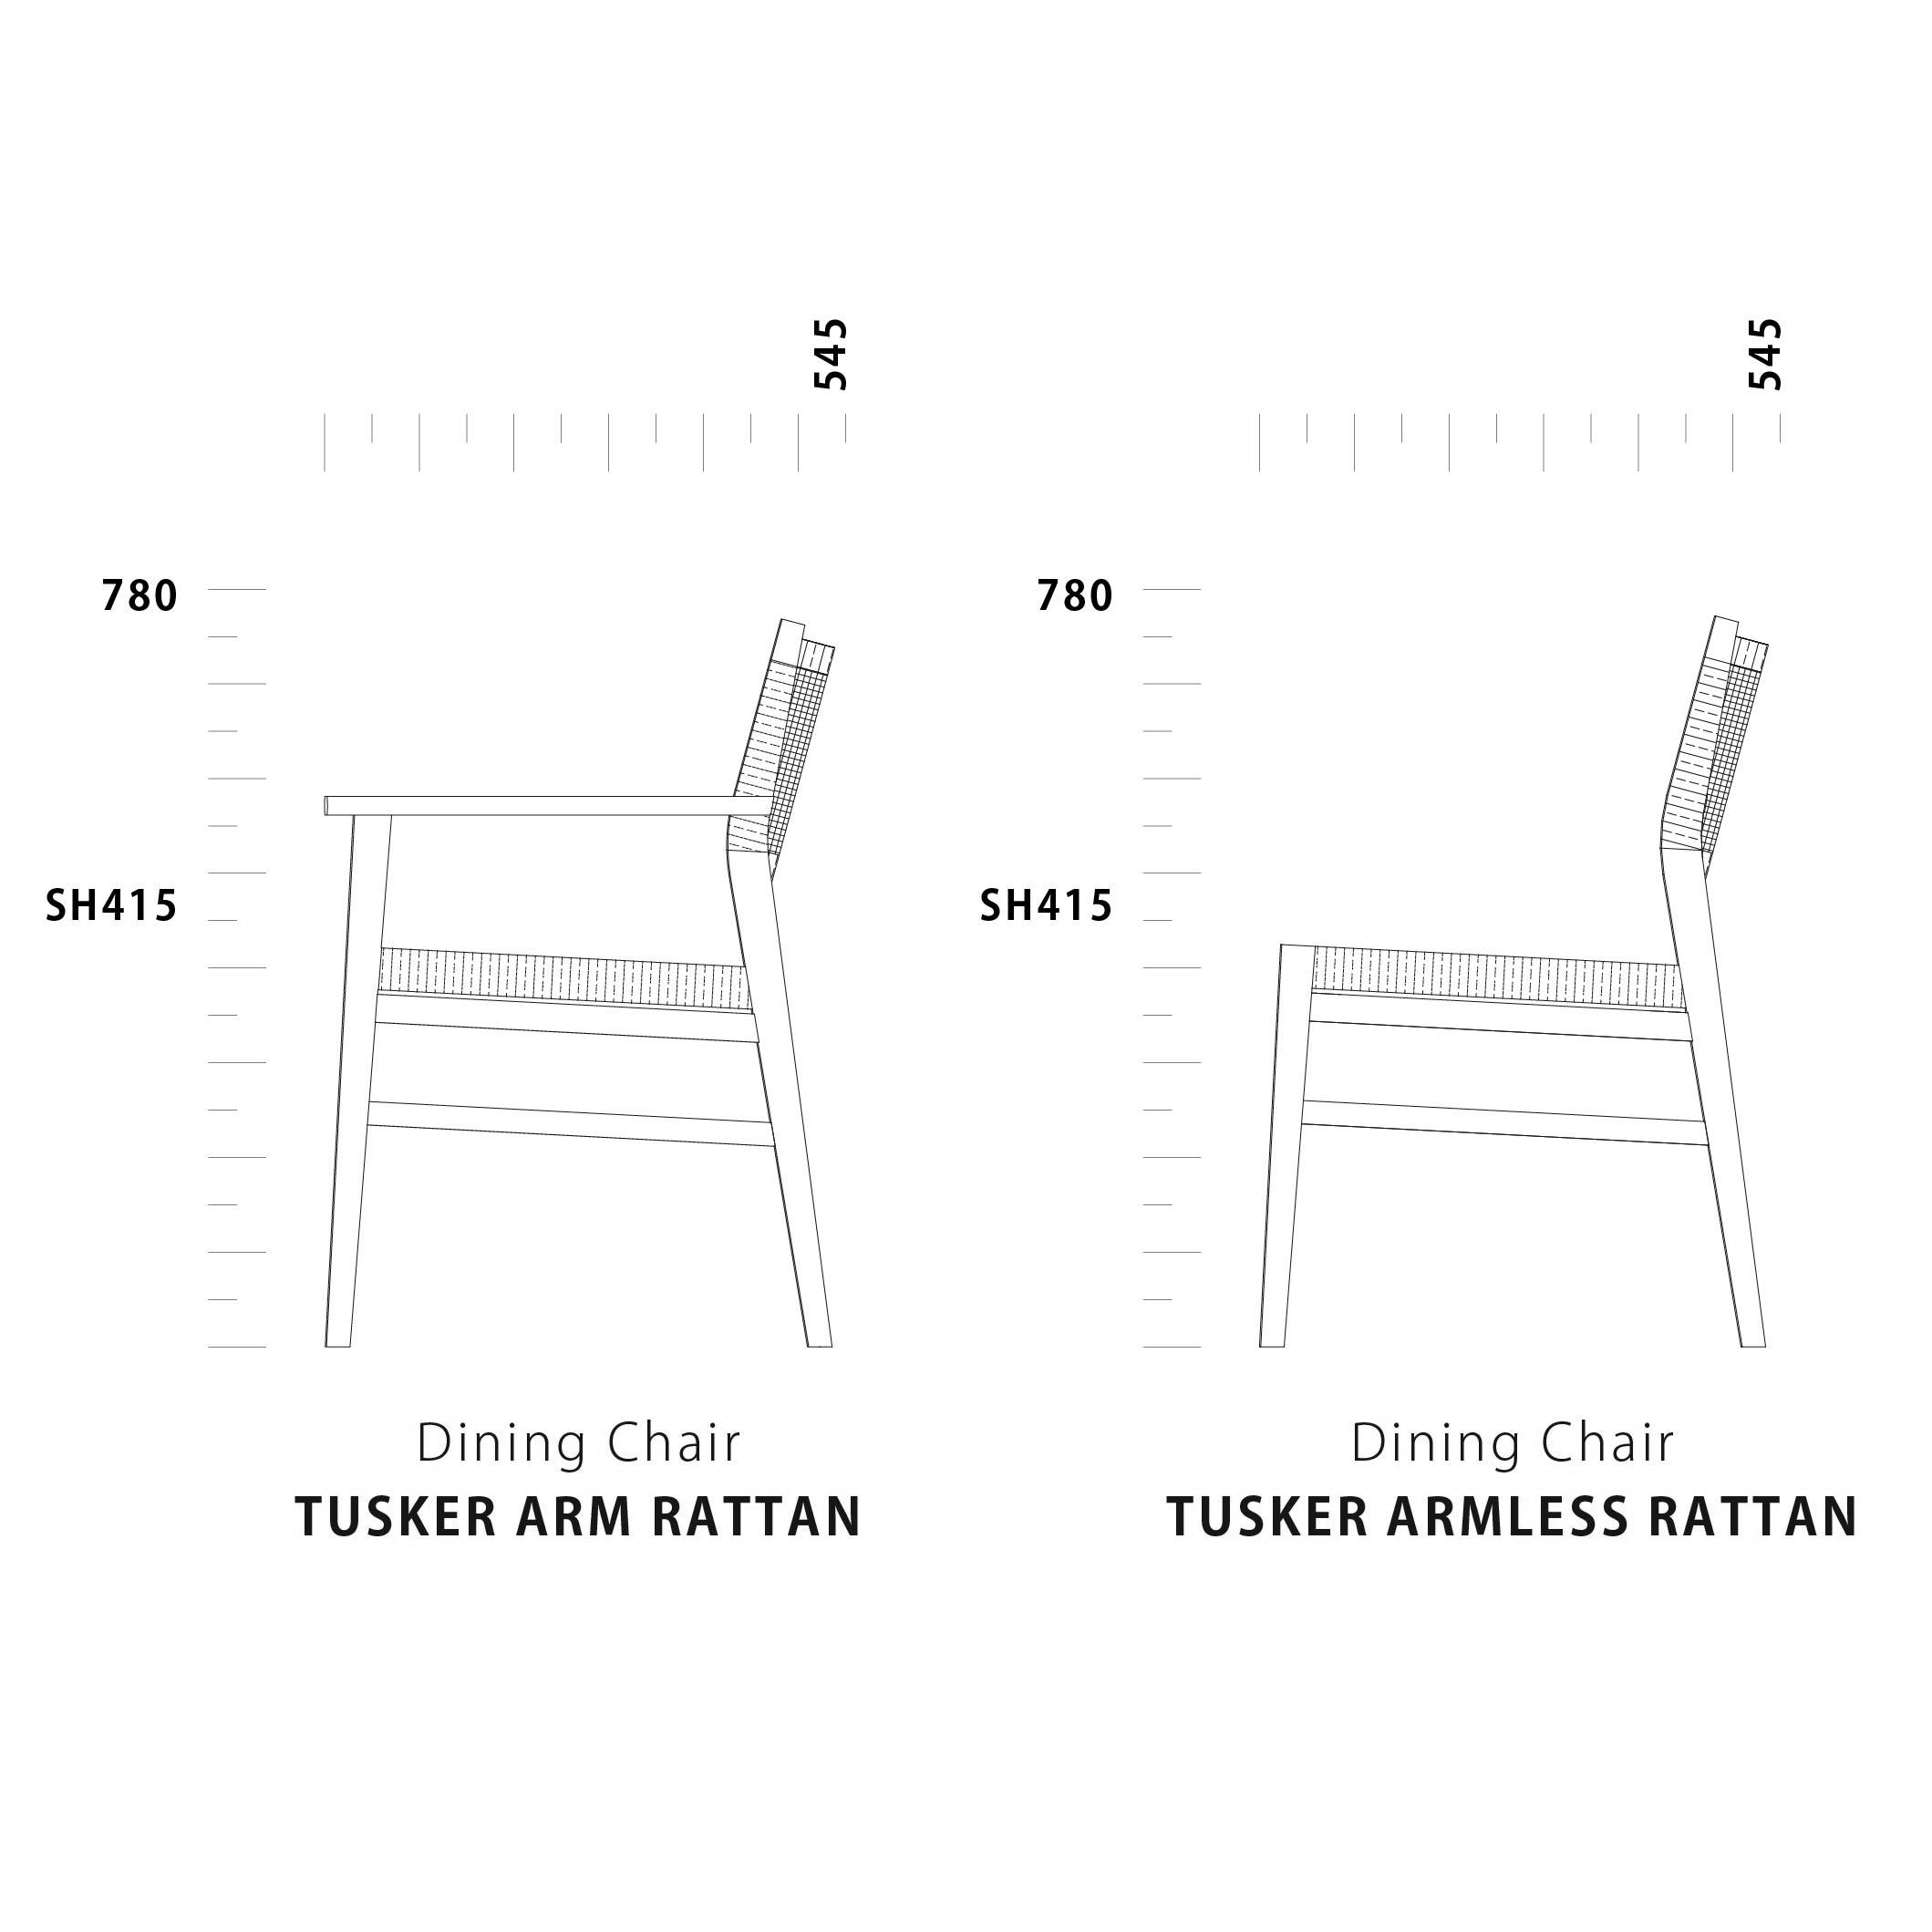 Dining Chair TUSKER Lattan